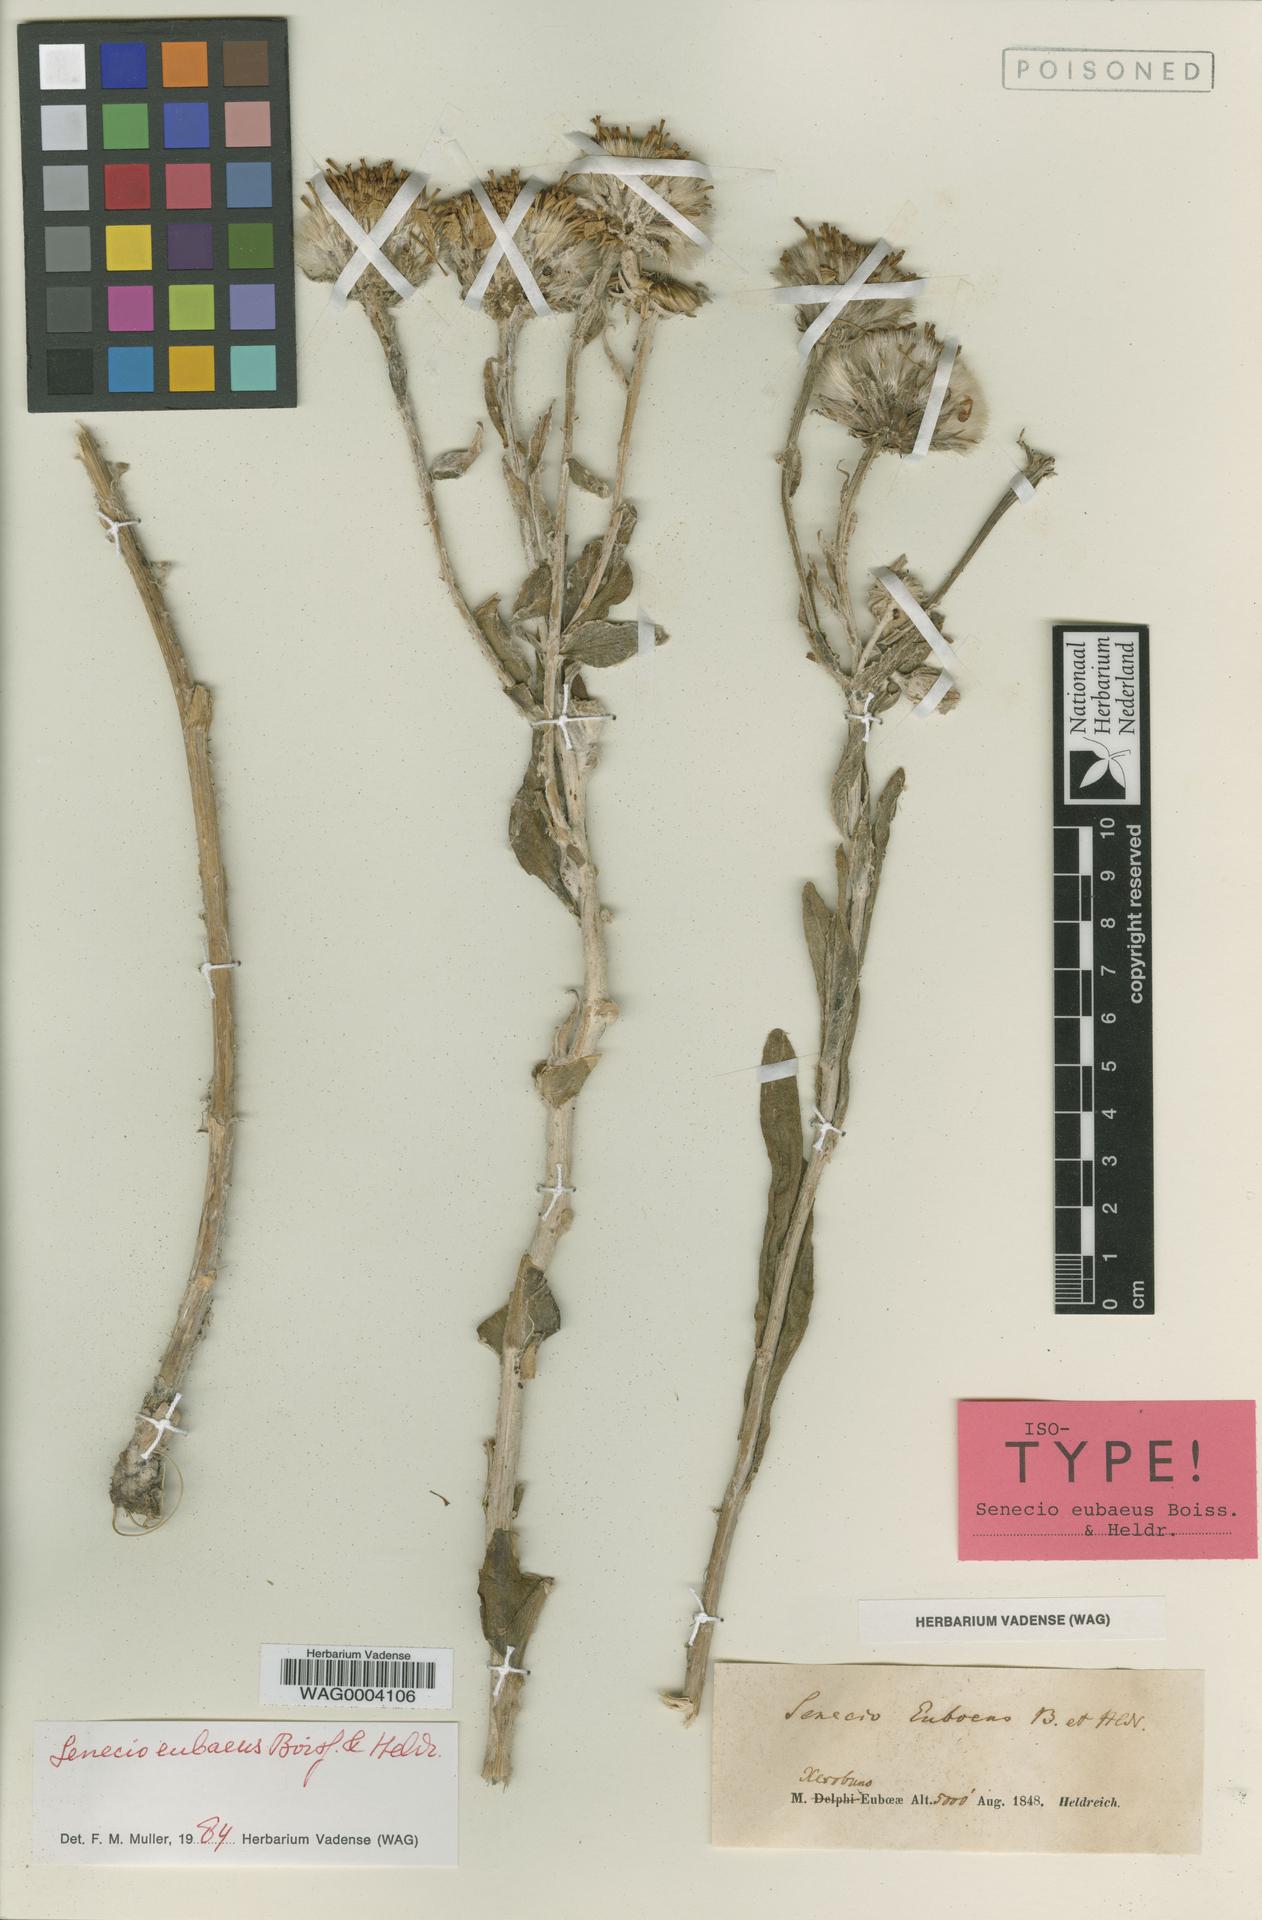 WAG0004106 | Senecio eubaeus Boiss. & Heldr.